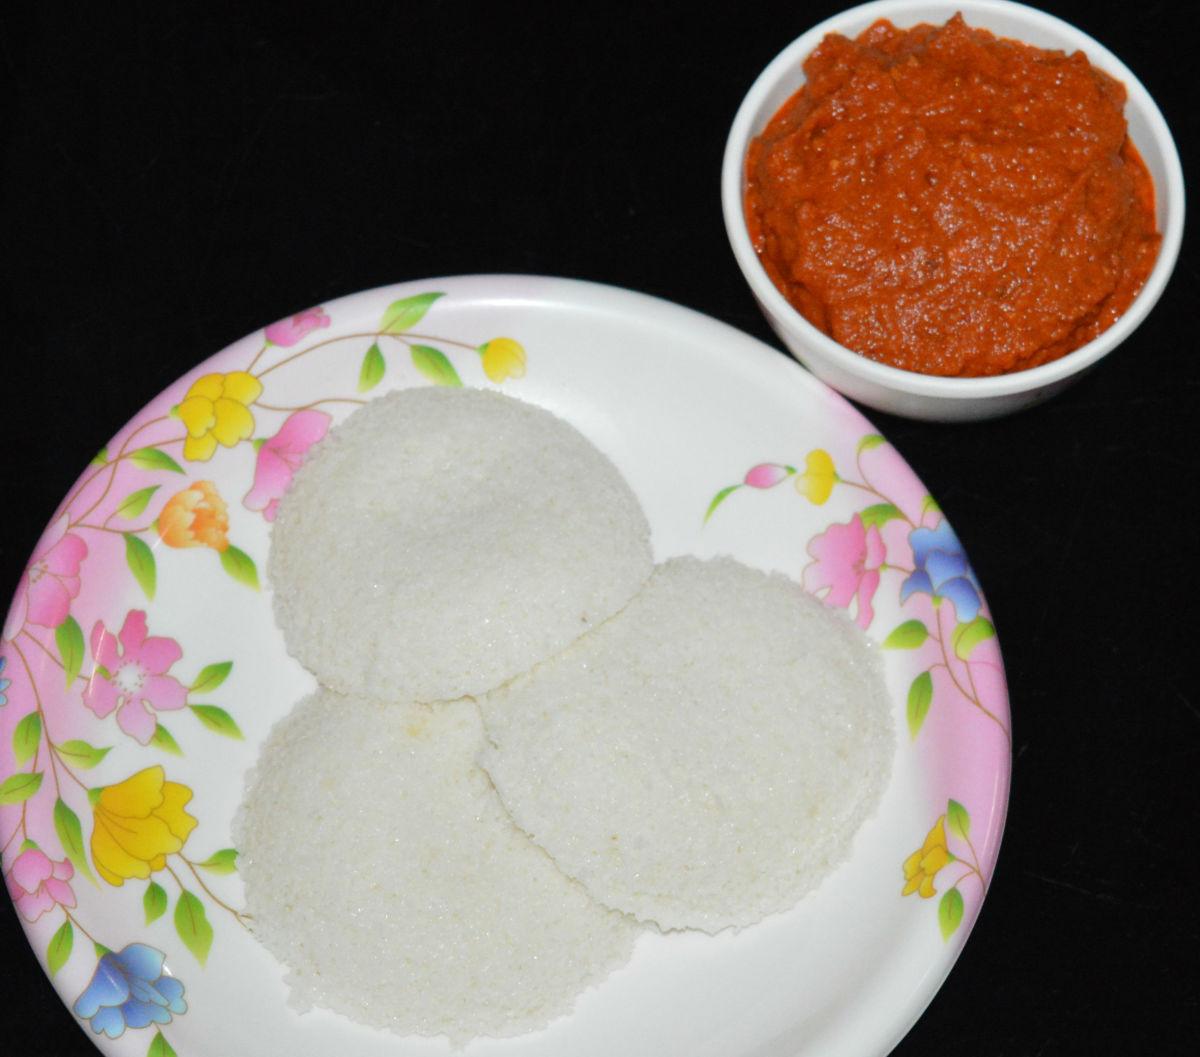 Serve this tomato lentil chutney with idli, dosa, or steamed rice. Enjoy the taste.